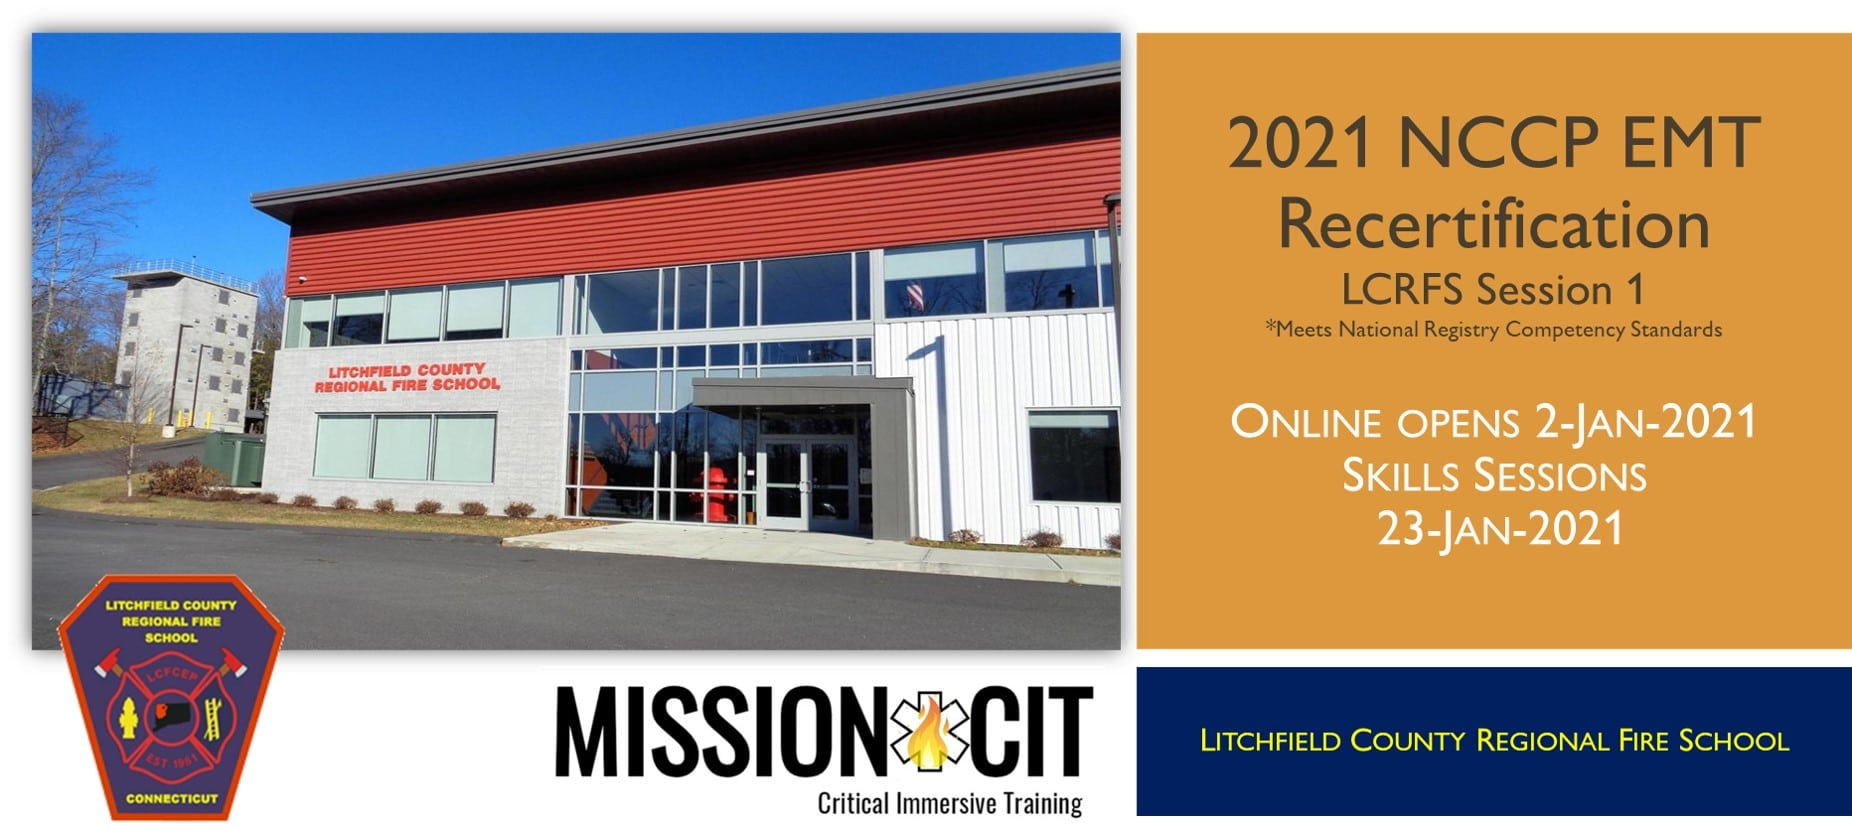 EMT NCCP 2021 Recertification Course | LCRFS Session 1